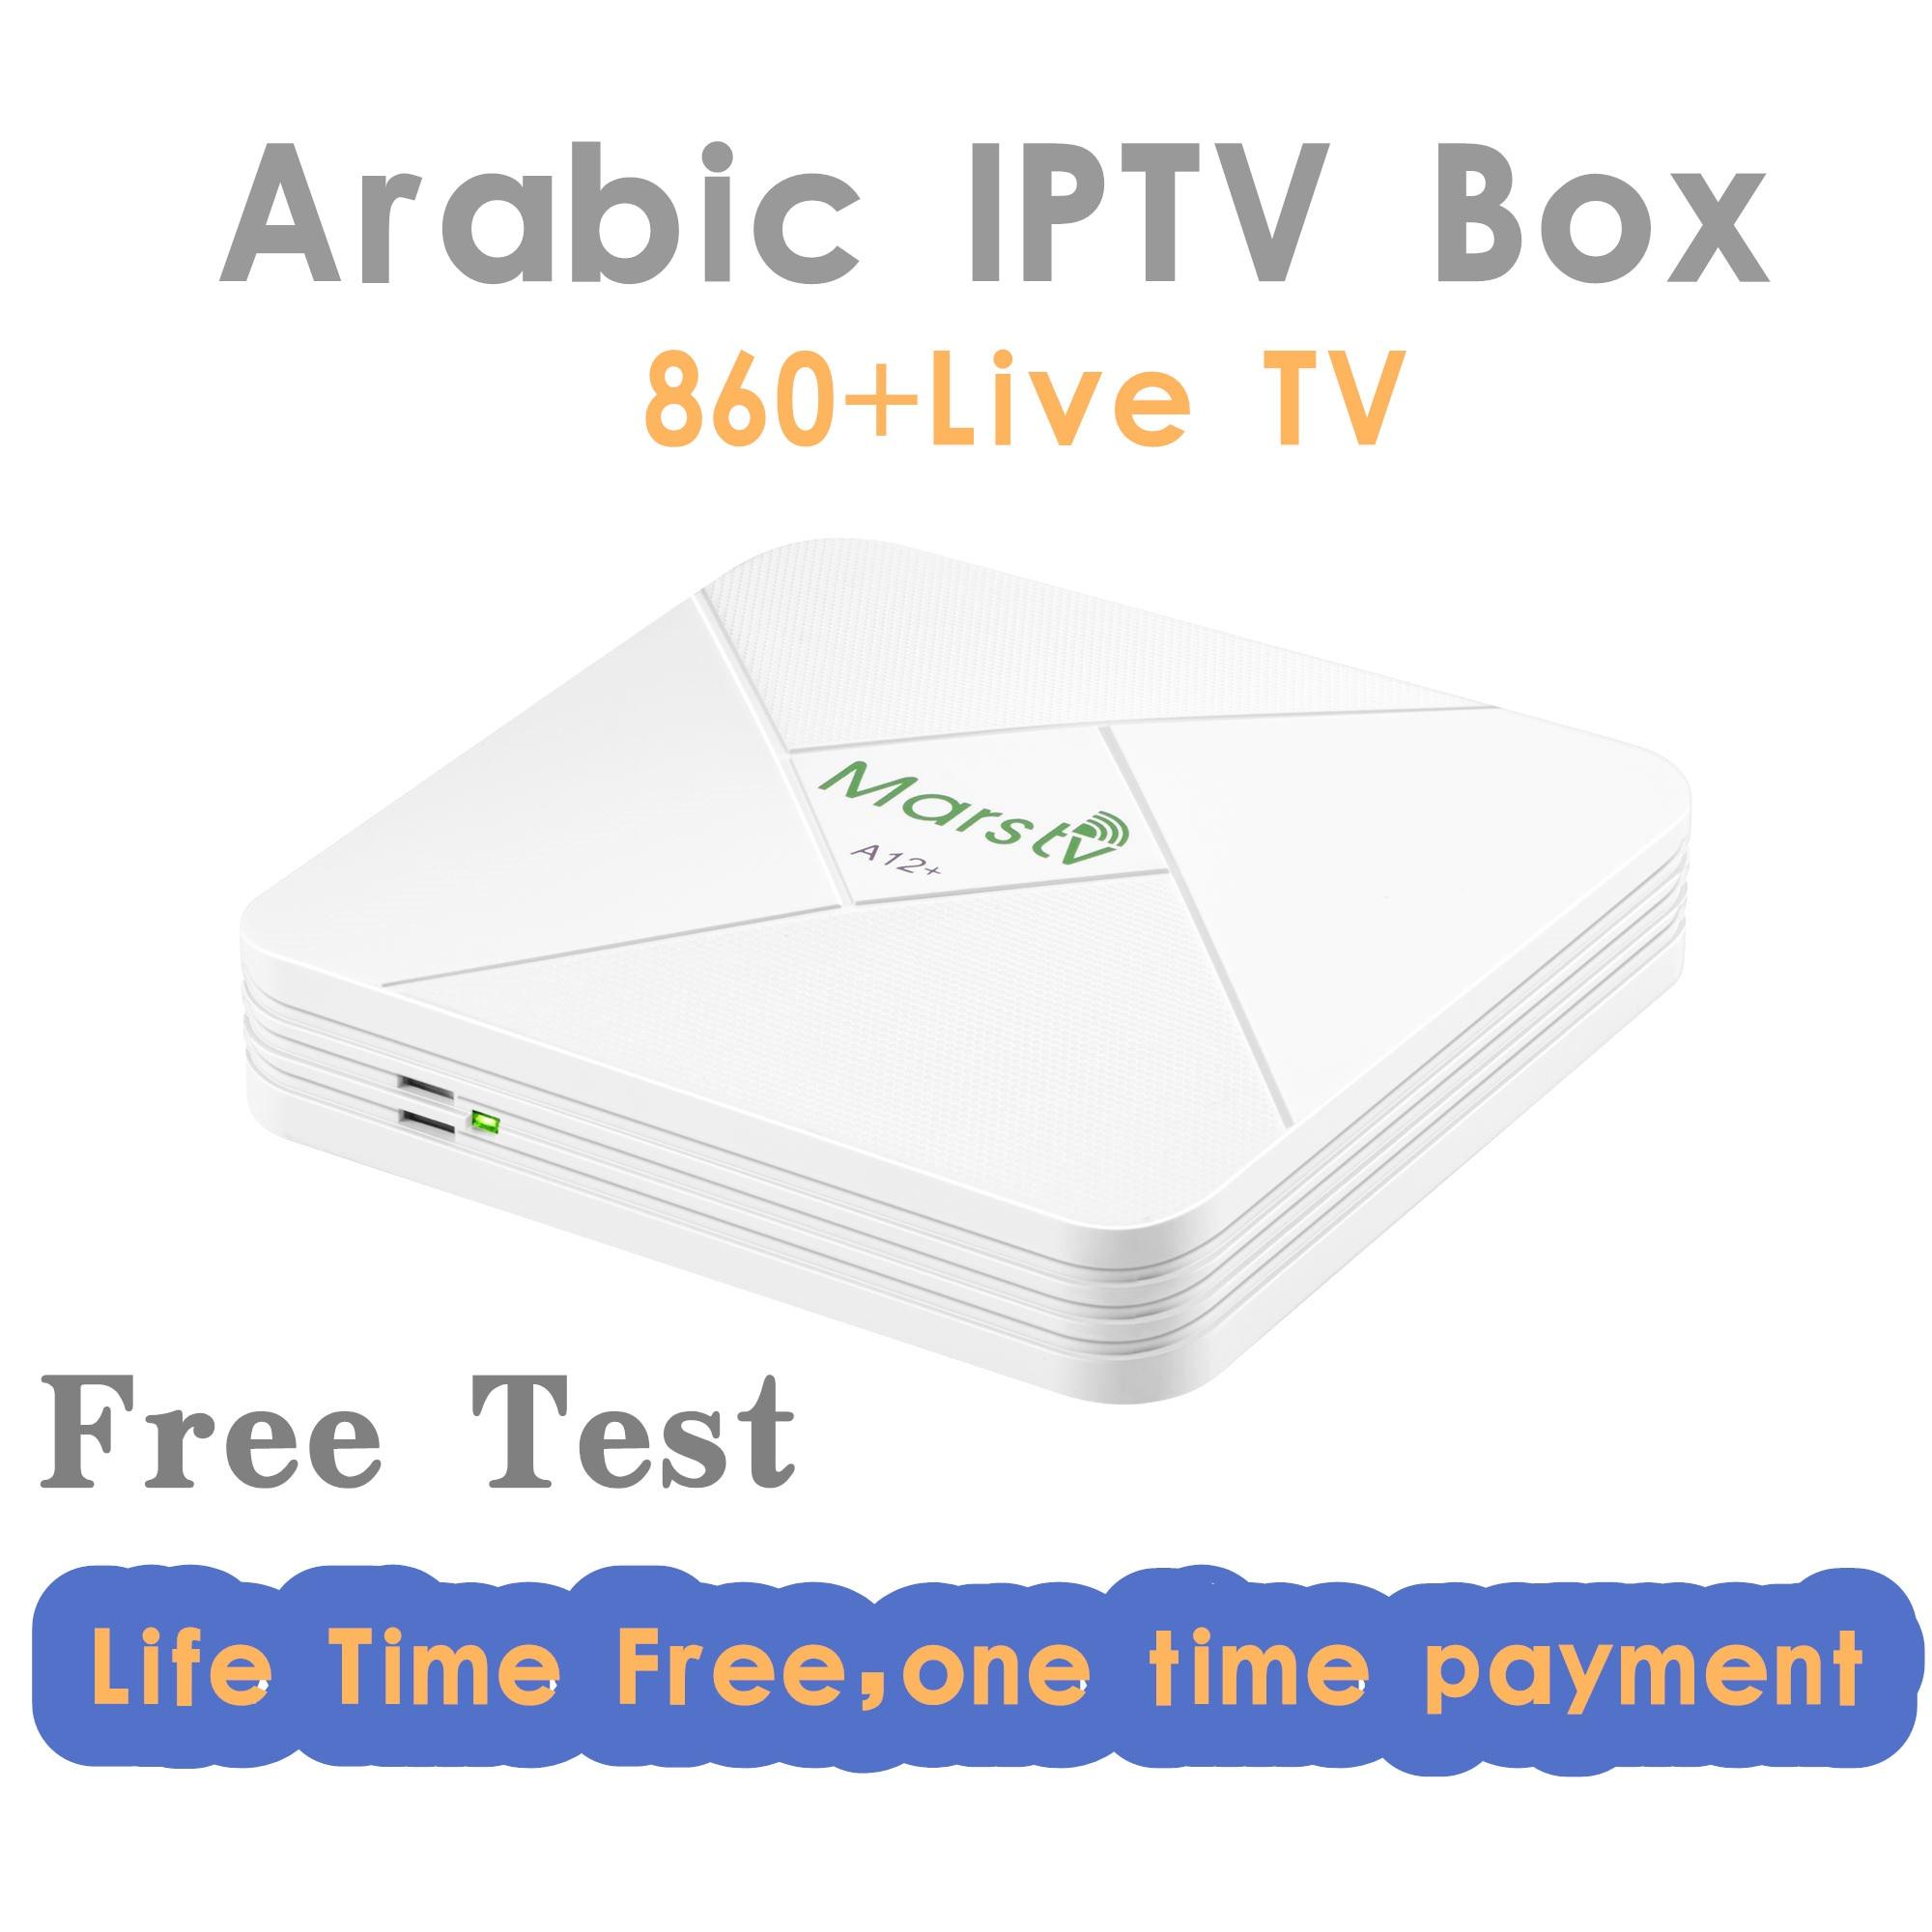 Vida IPTV arábico gratis caja con 860 + TV Fr/África/sueco/Árabe IP TV Box libre para siempre iptv código